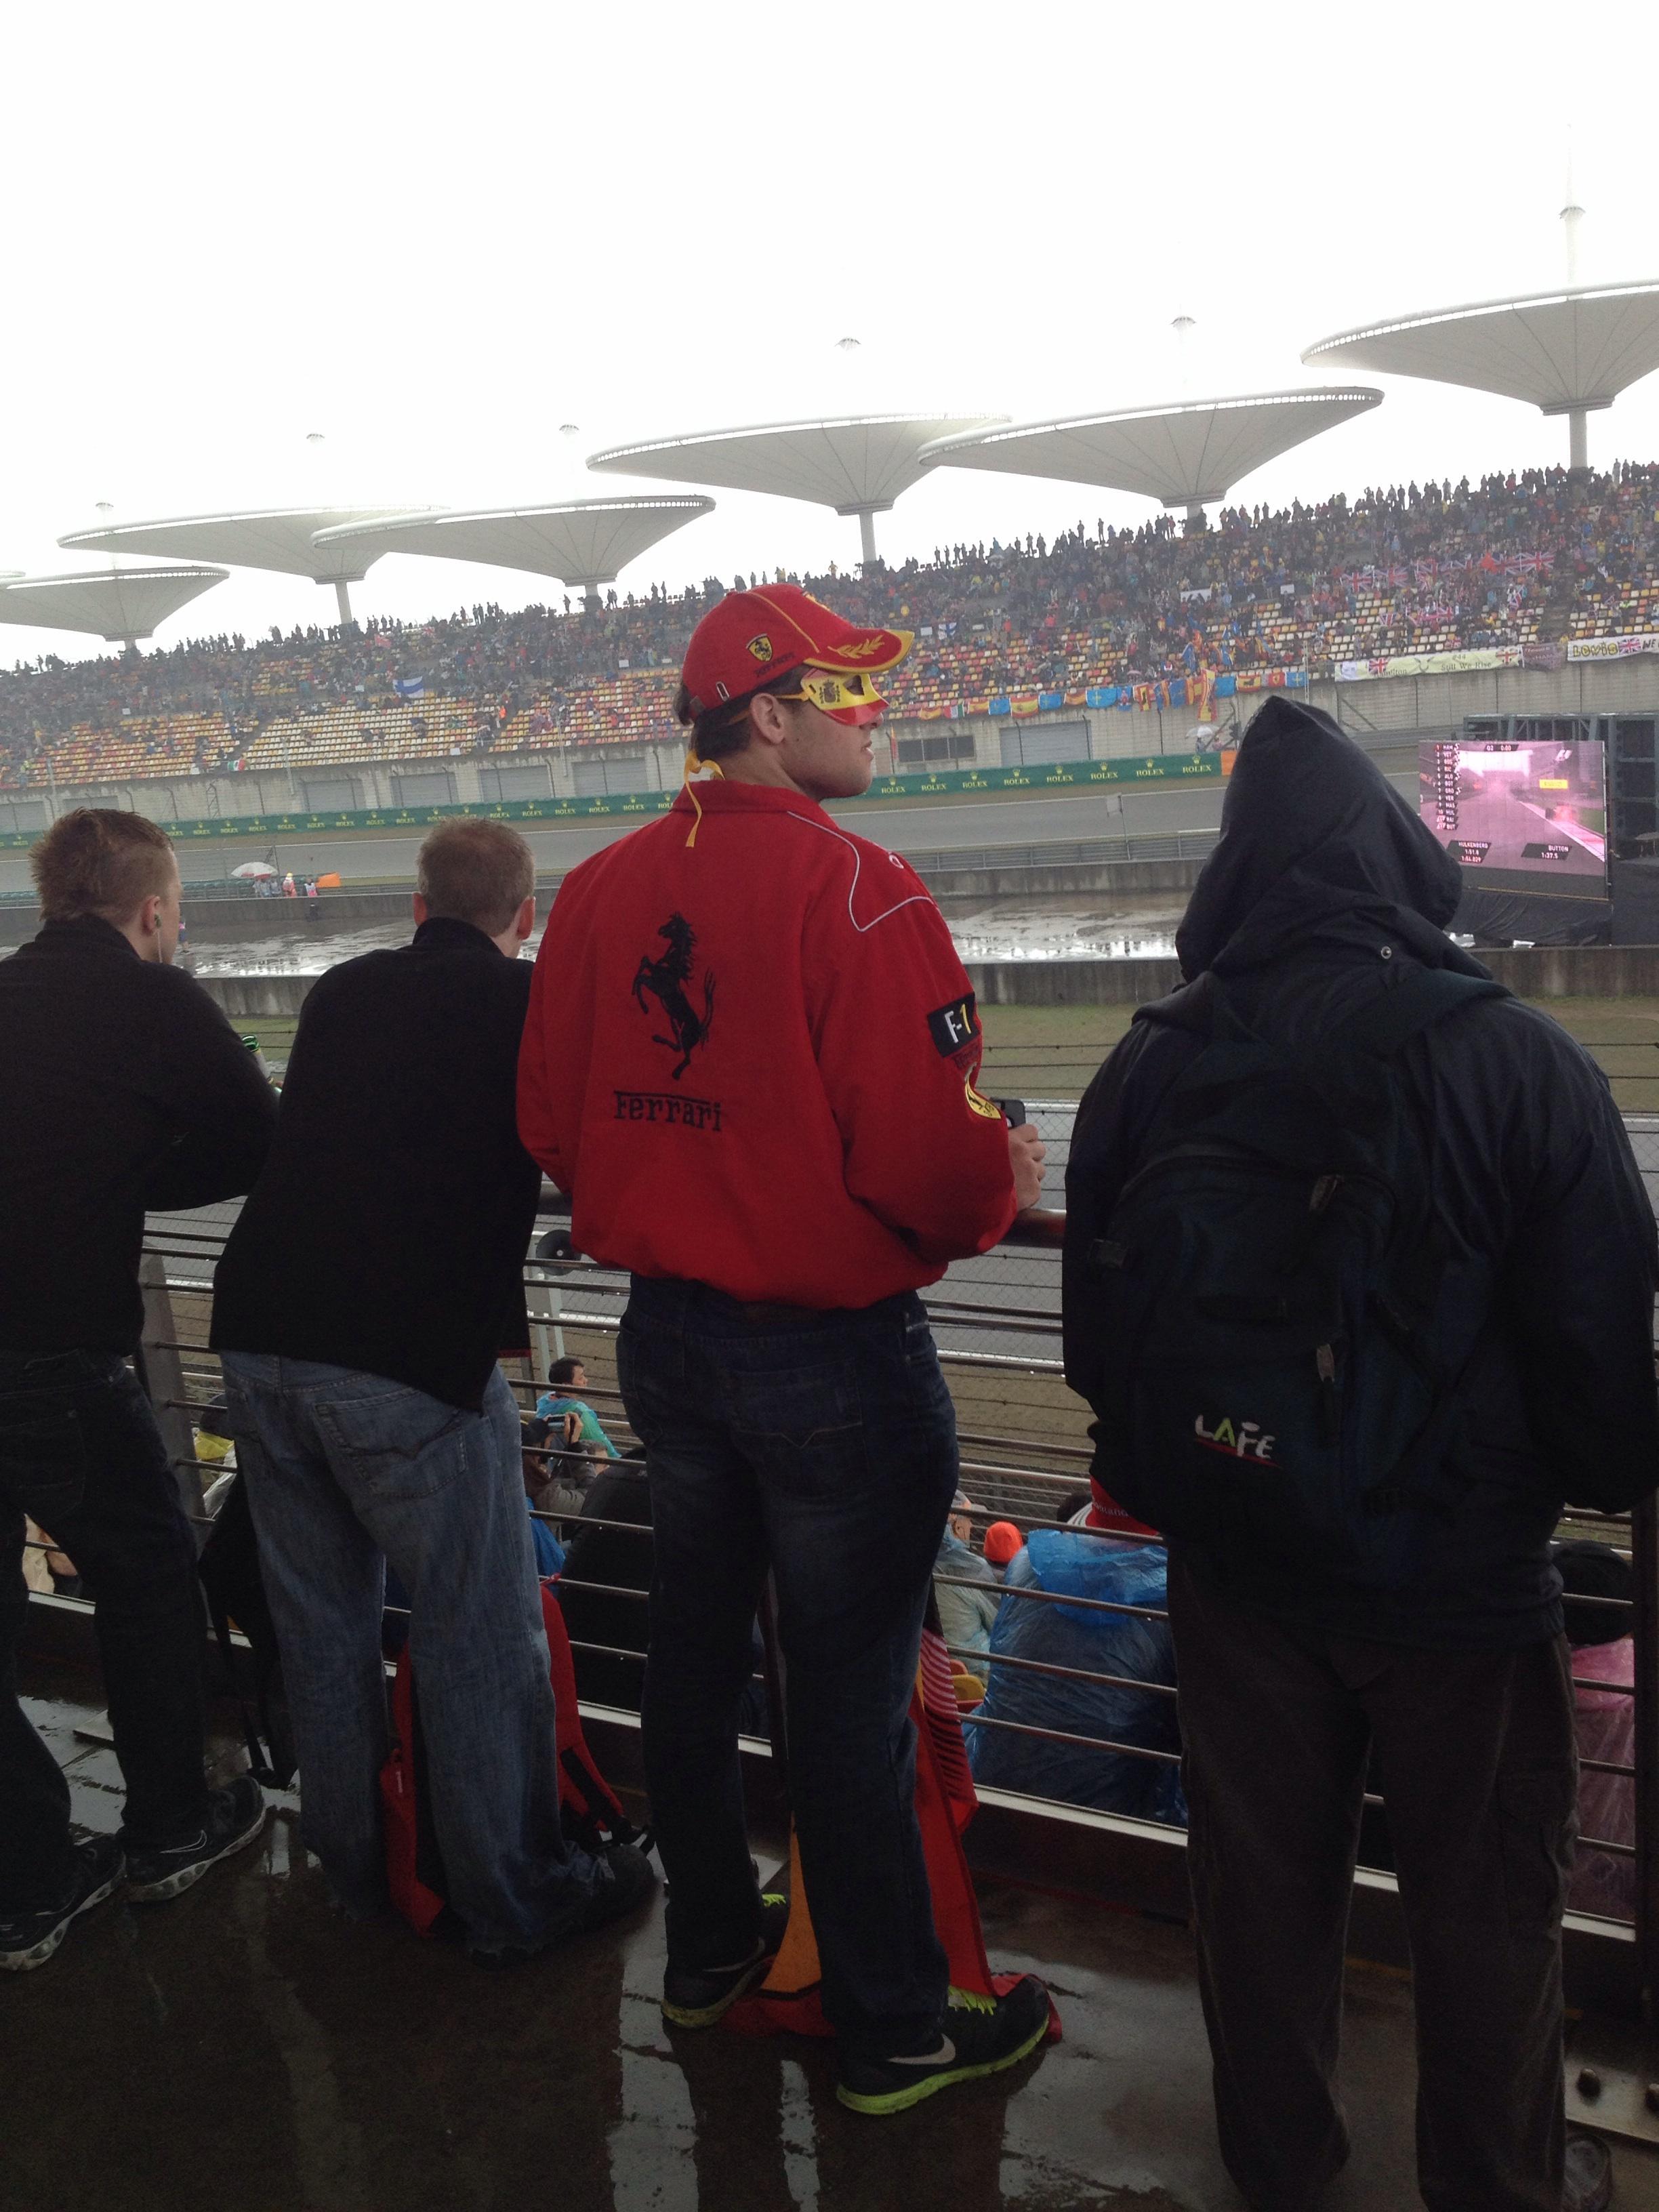 Or all in on Ferrari...